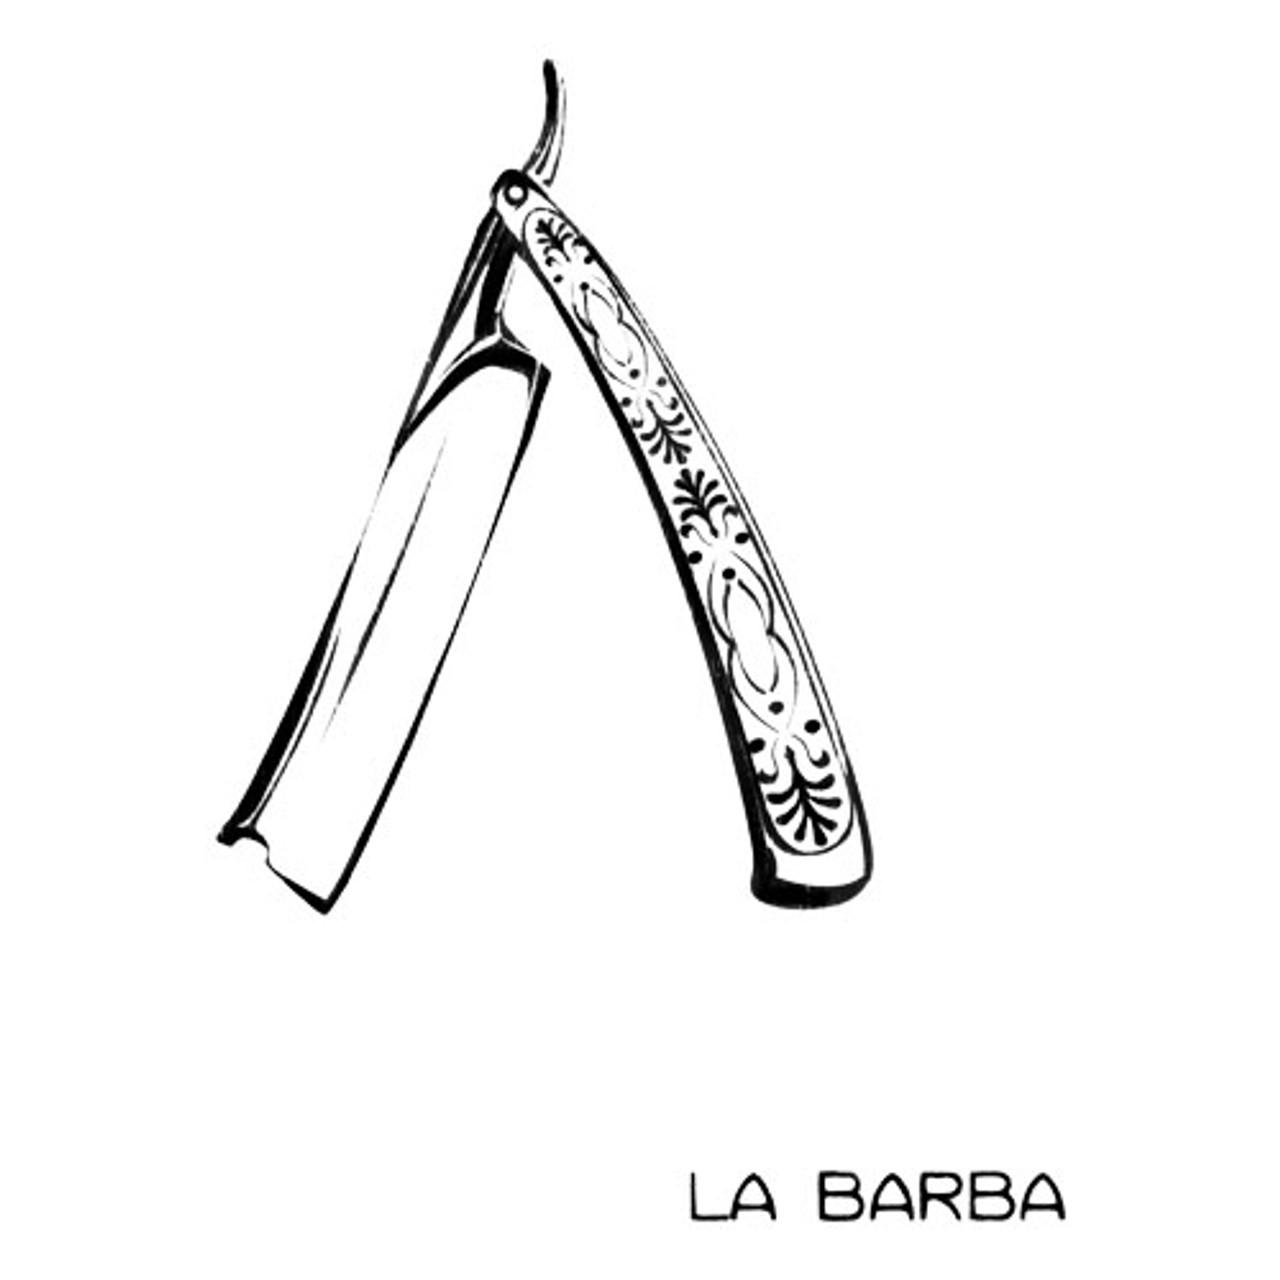 La Barba Red Corona Cigars - 5.75 x 46 (Box of 12)